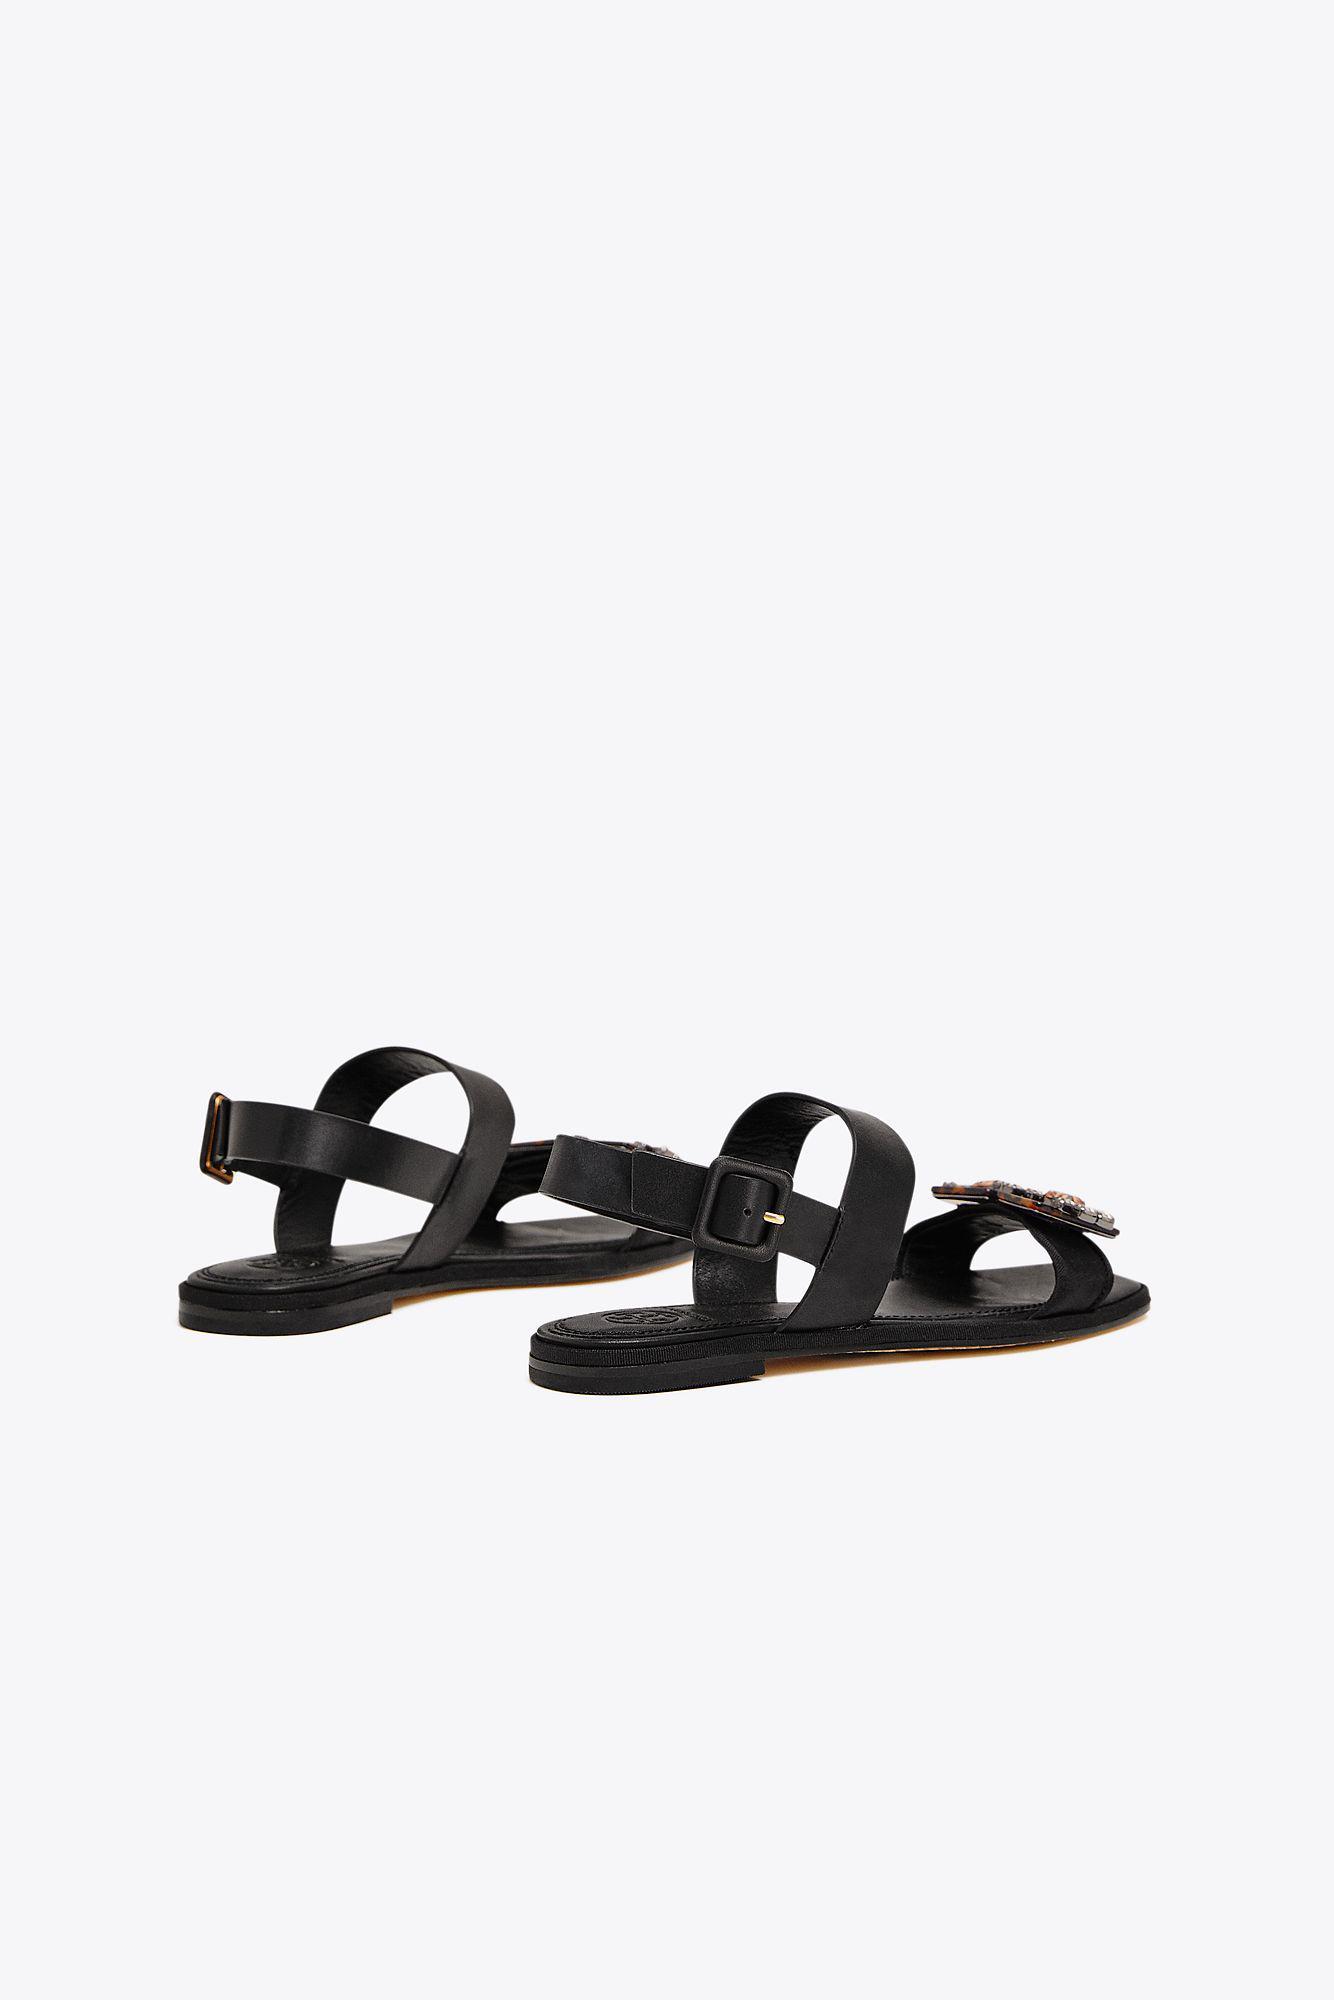 372ad063420 Tory Burch - Black Delaney Embellished Flat Sandal - Lyst. View fullscreen